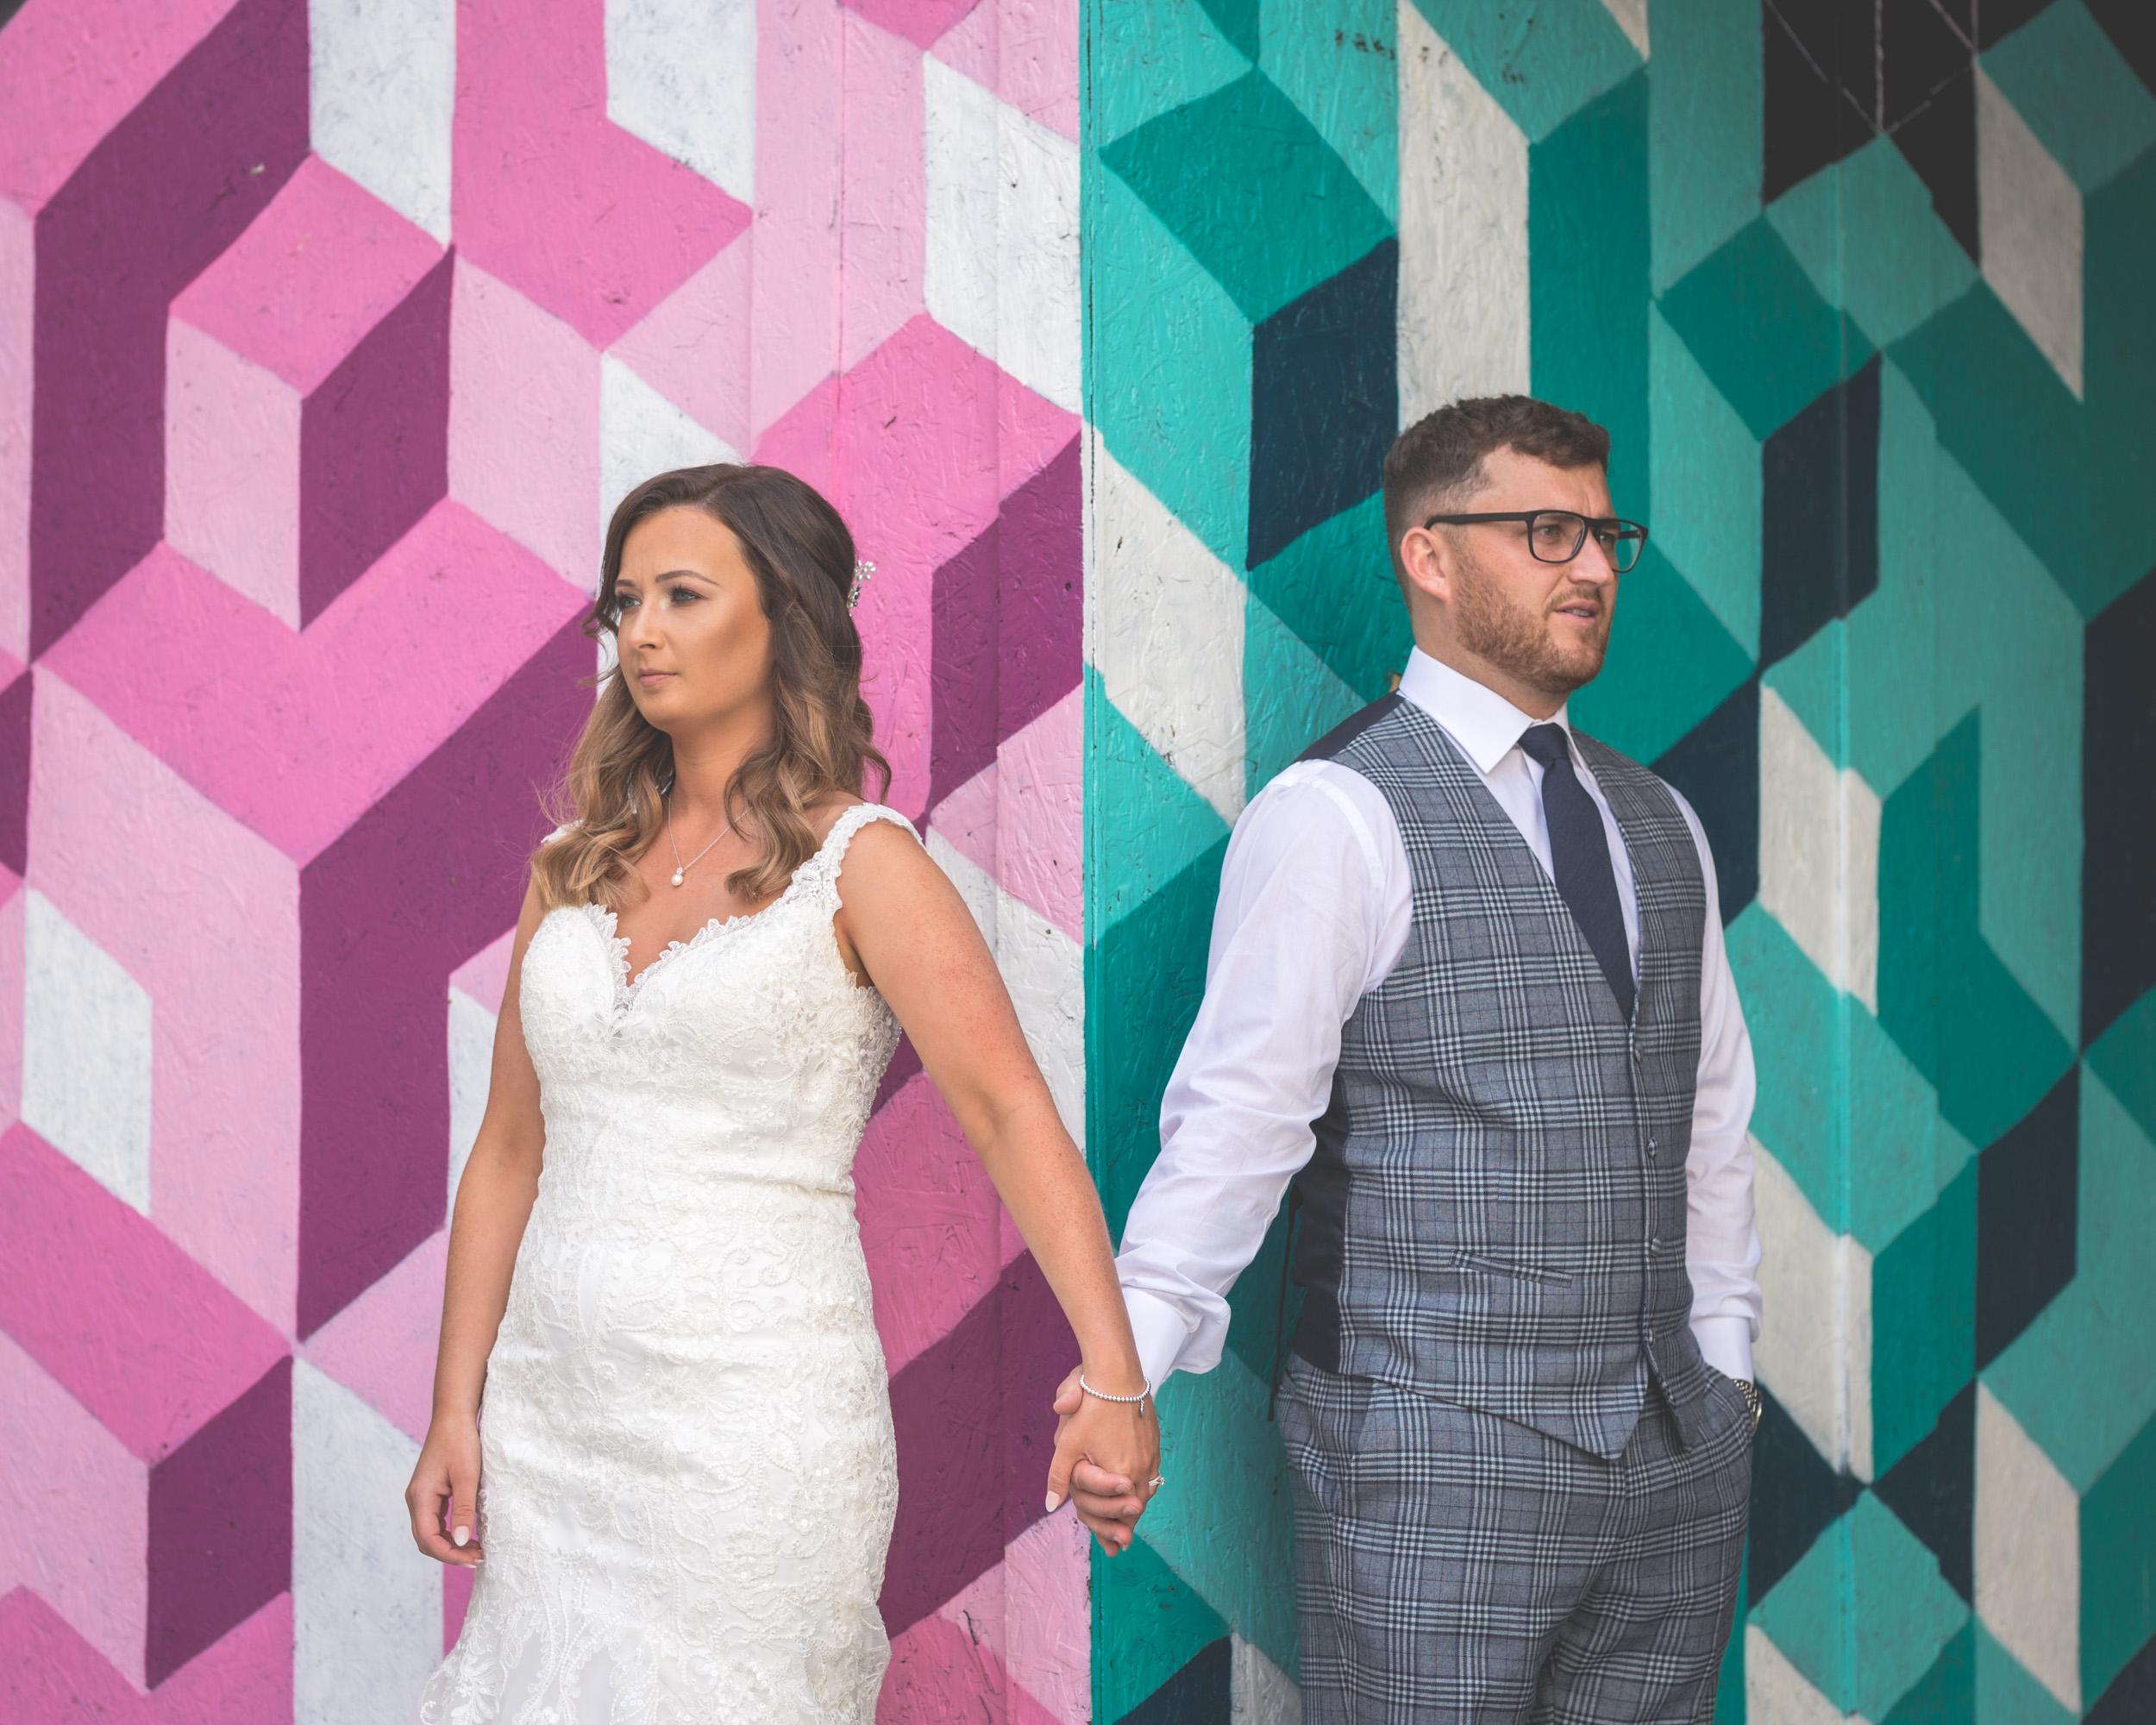 Brian McEwan   Northern Ireland Wedding Photographer   Rebecca & Michael   Portraits-97.jpg